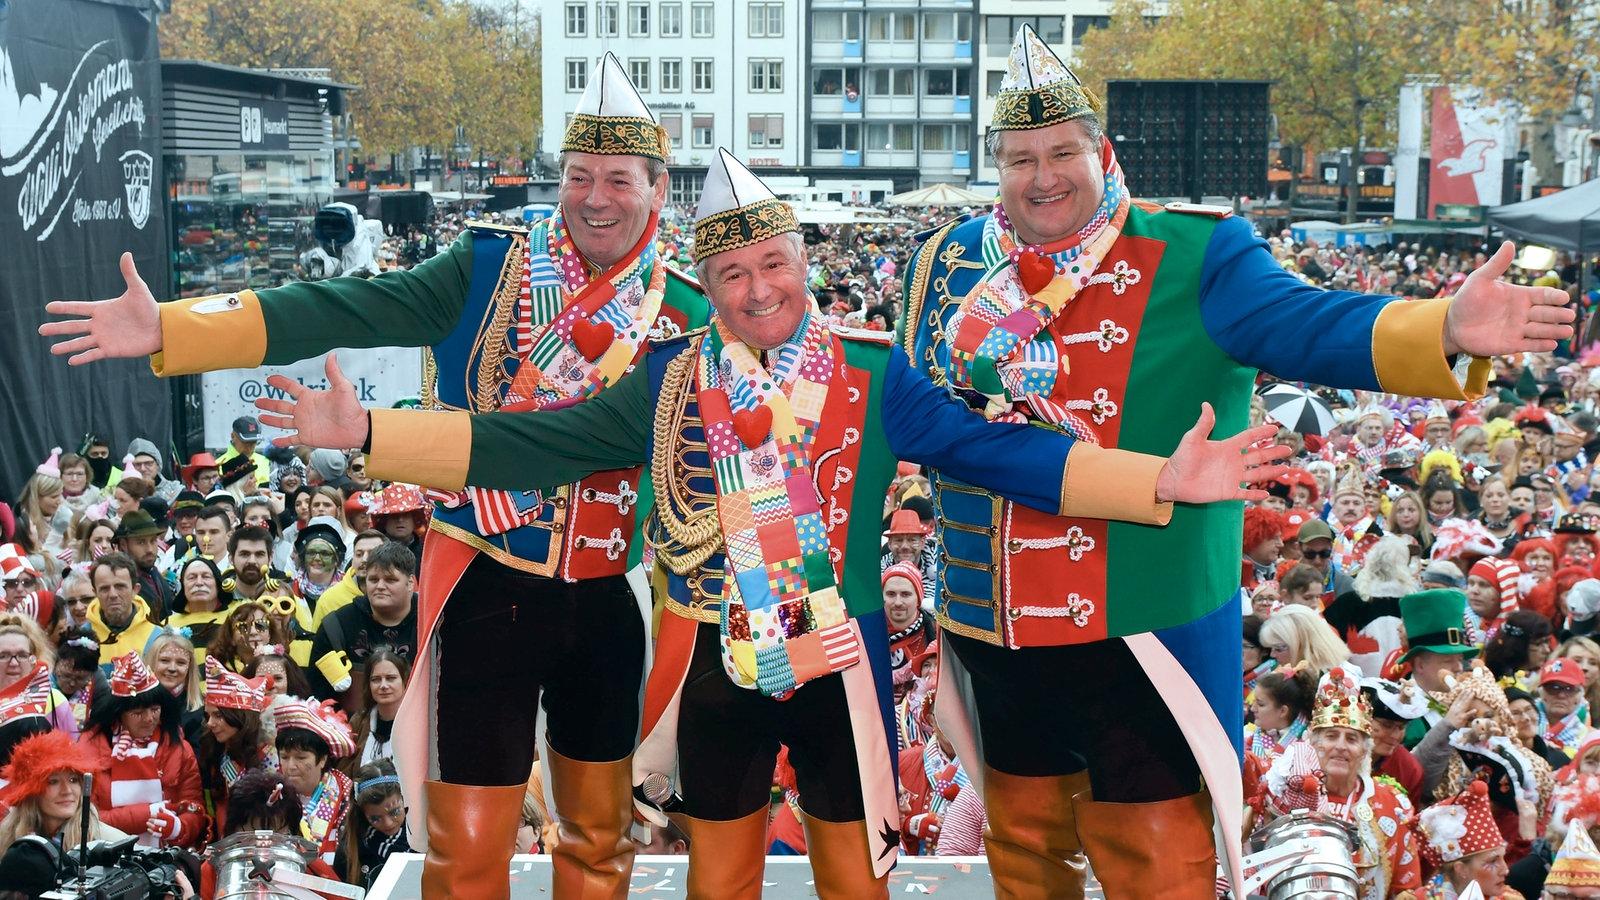 Gürzenich Köln Karneval 2021